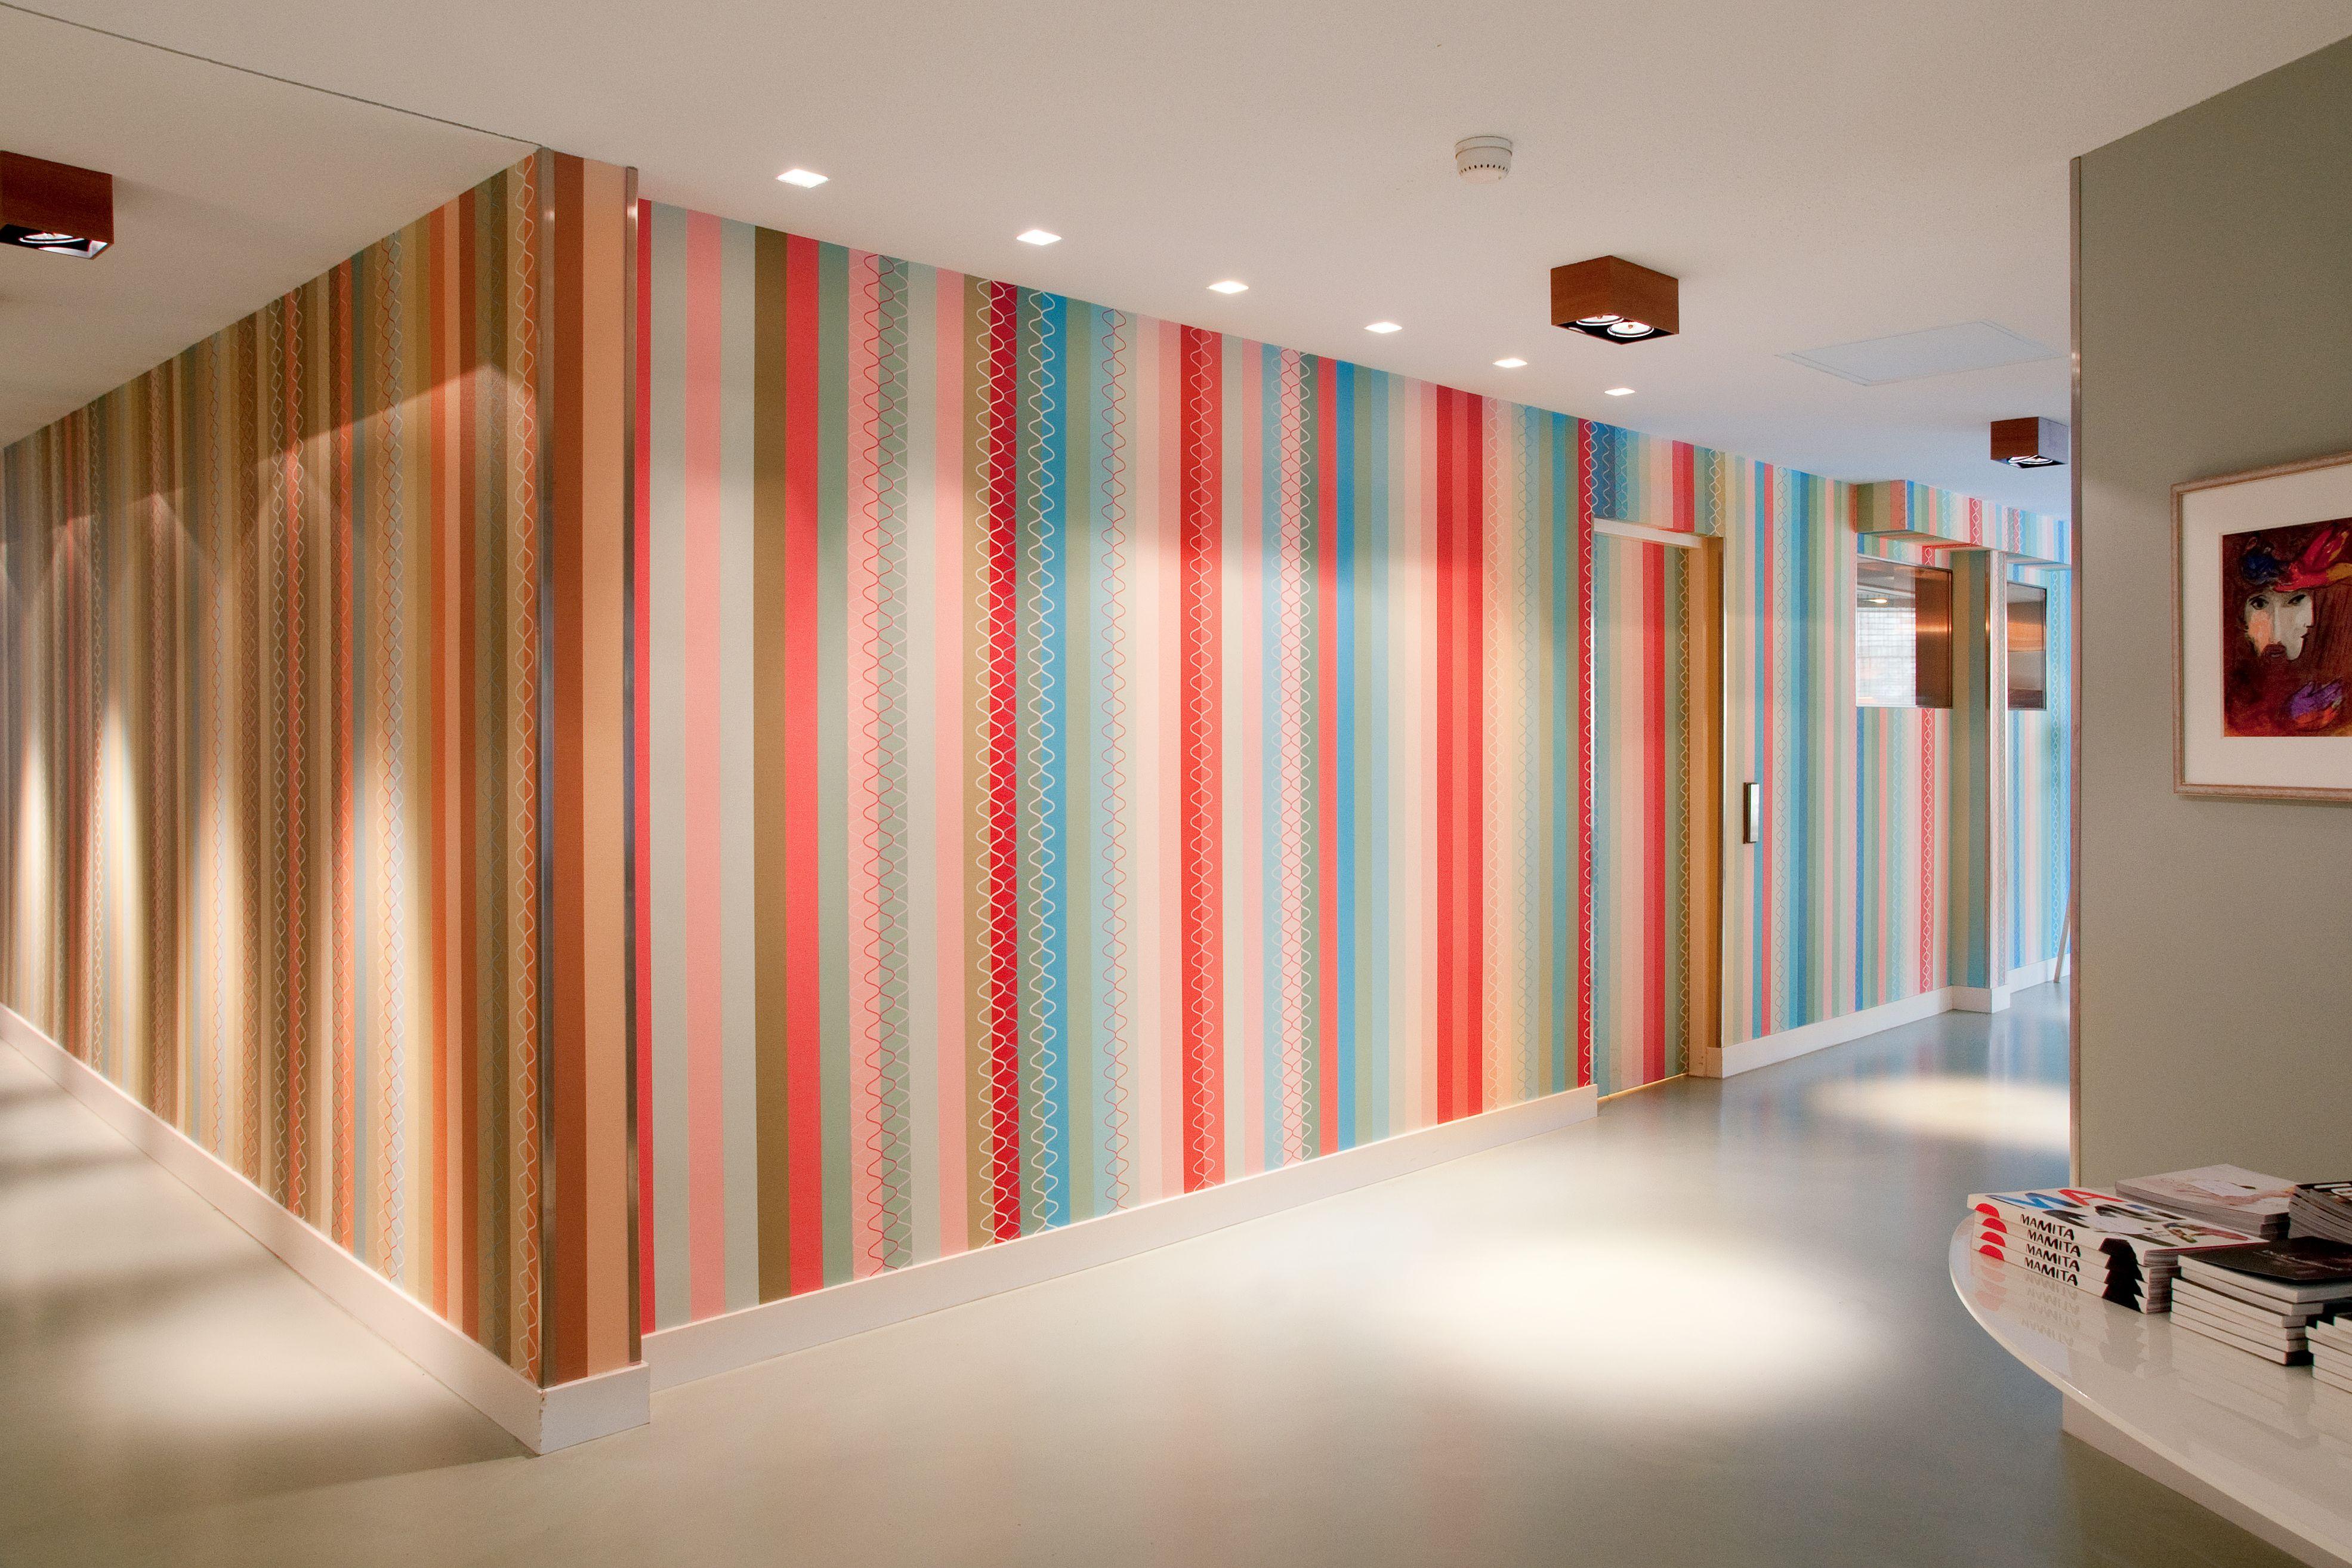 Blooming Hotel Bergen aan Zee Digital Wallpaper/Fotobehang Stripes by Edward van Vliet - BN Wallcoverings